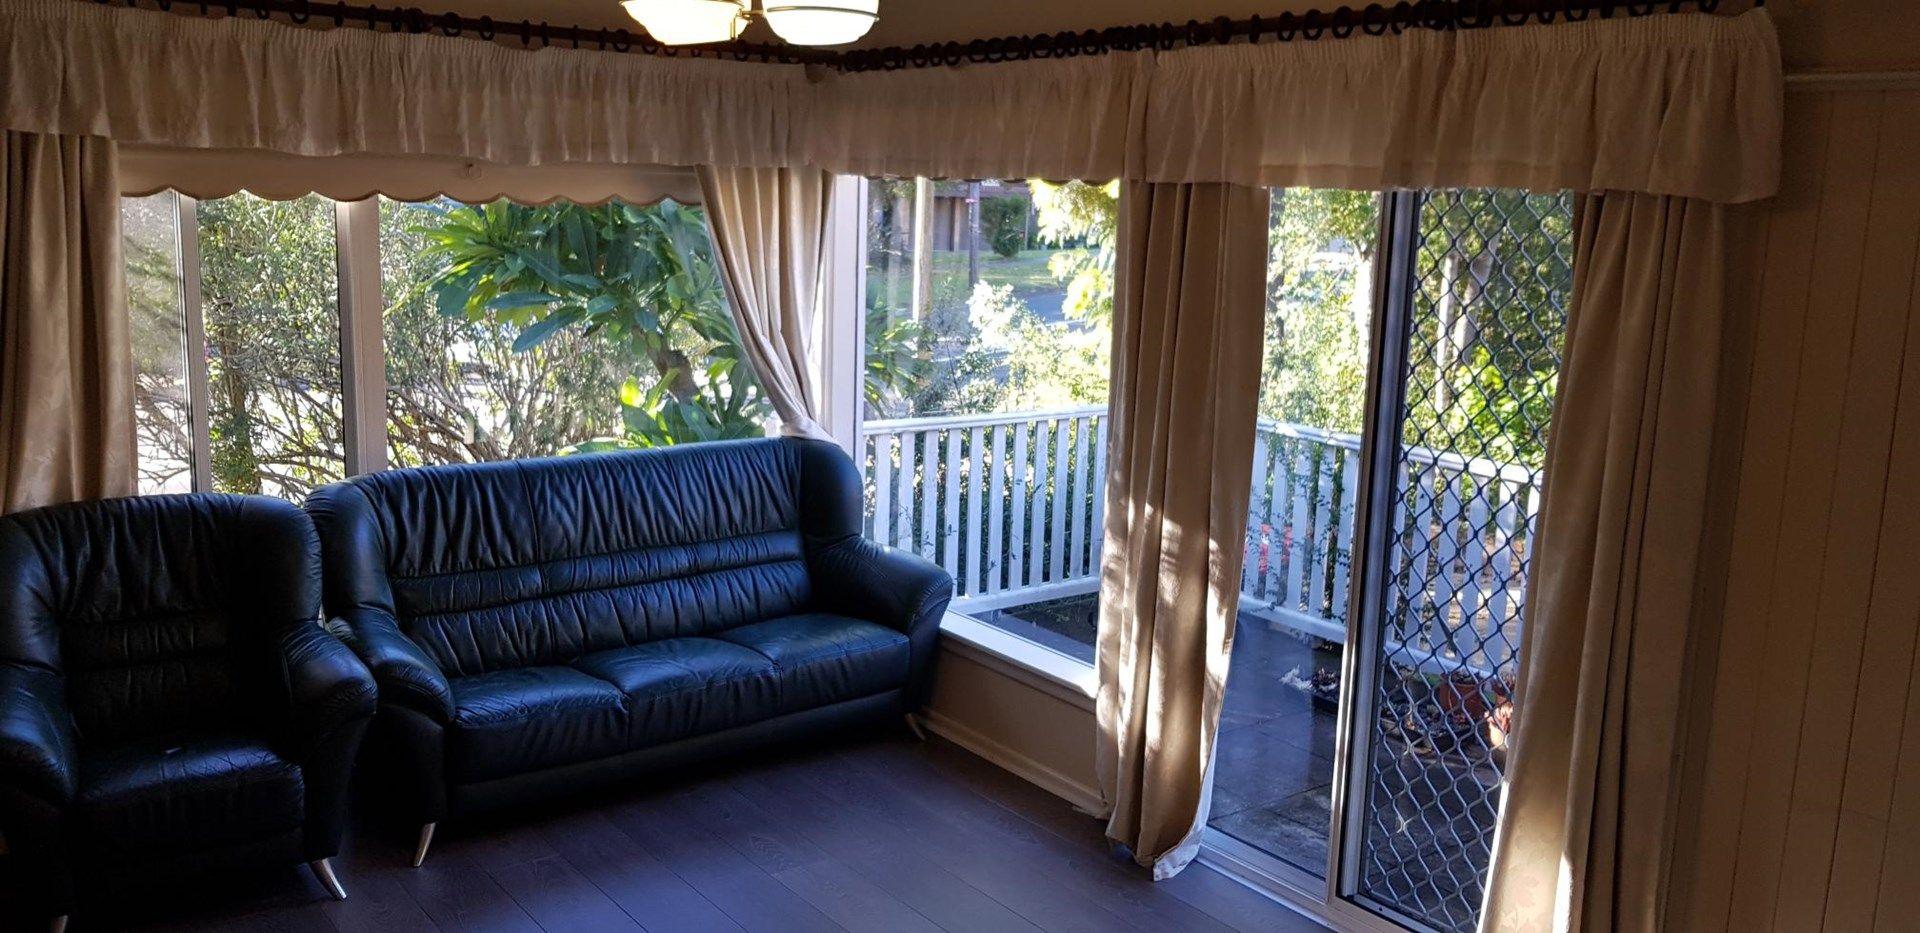 193 Carlingford  Road, Carlingford NSW 2118, Image 2